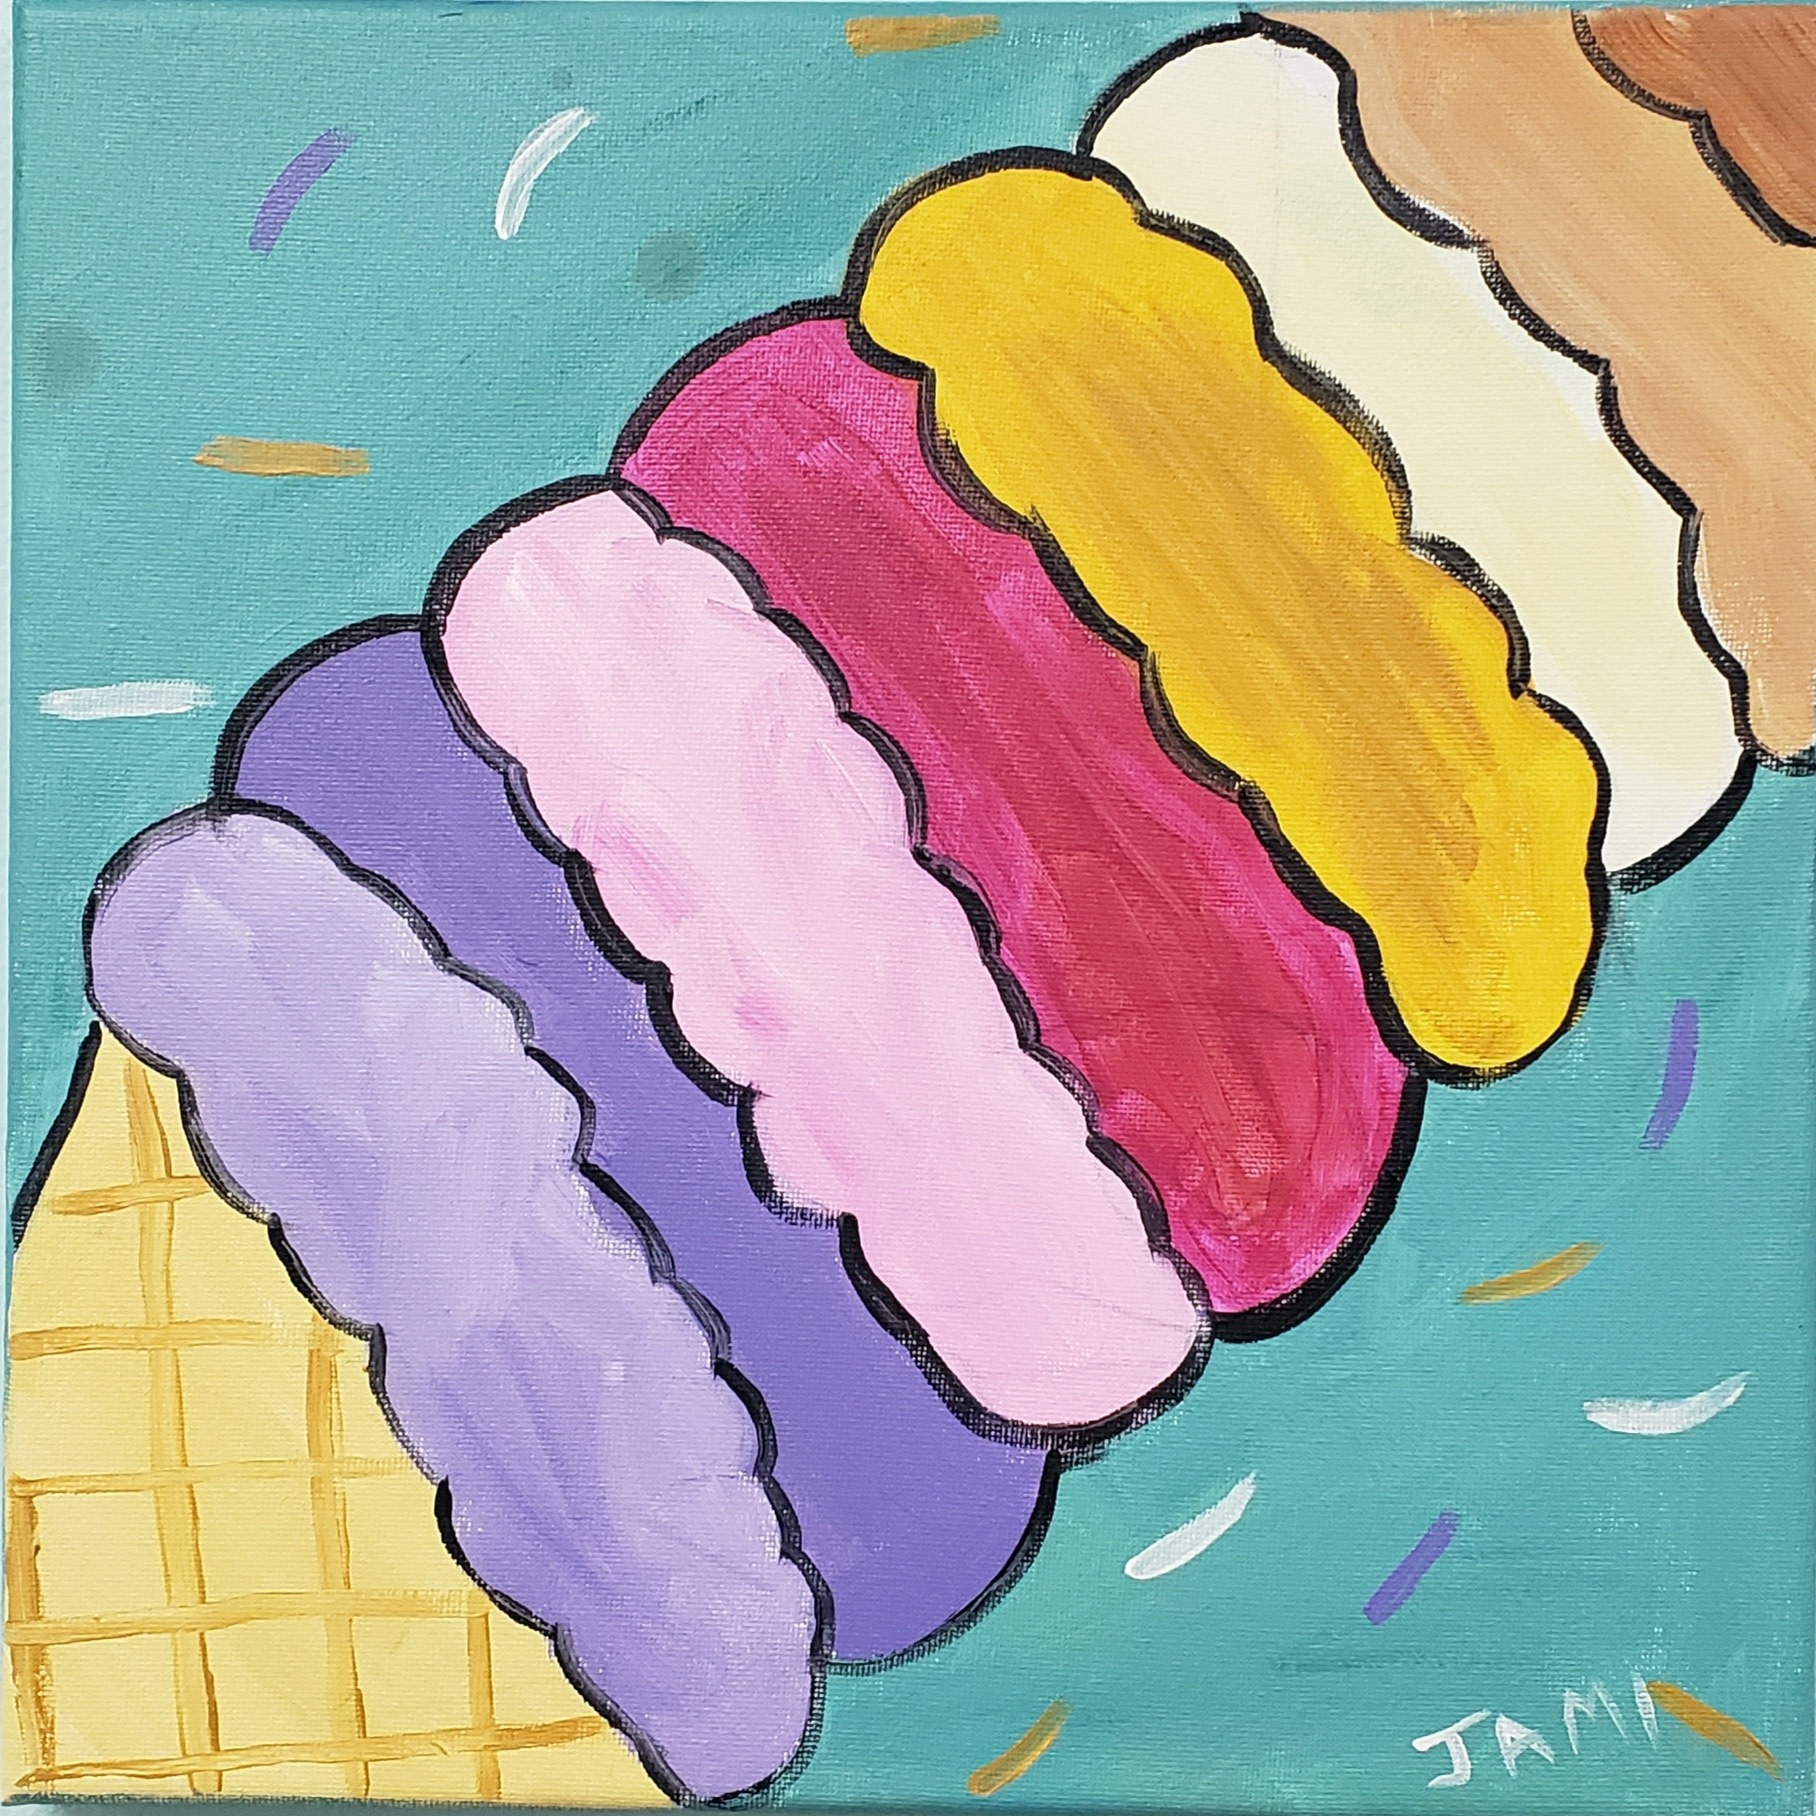 Ice Cream Cone Painting Class SAT JUNE 15TH 11AM